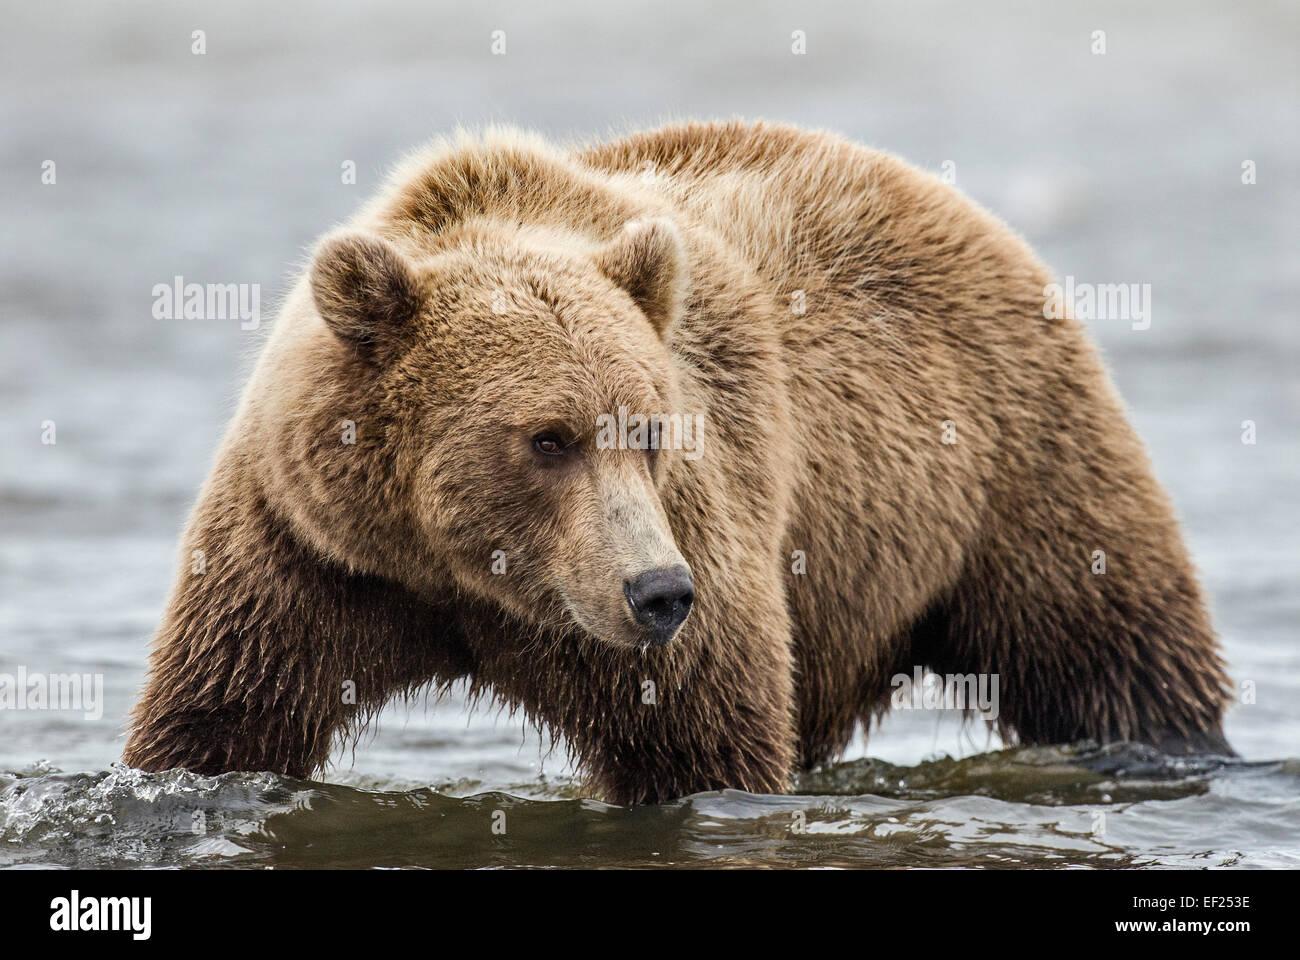 A coastal brown bear stalks salmon in a tidal pool at Lake Clark NP, Alaska - Stock Image